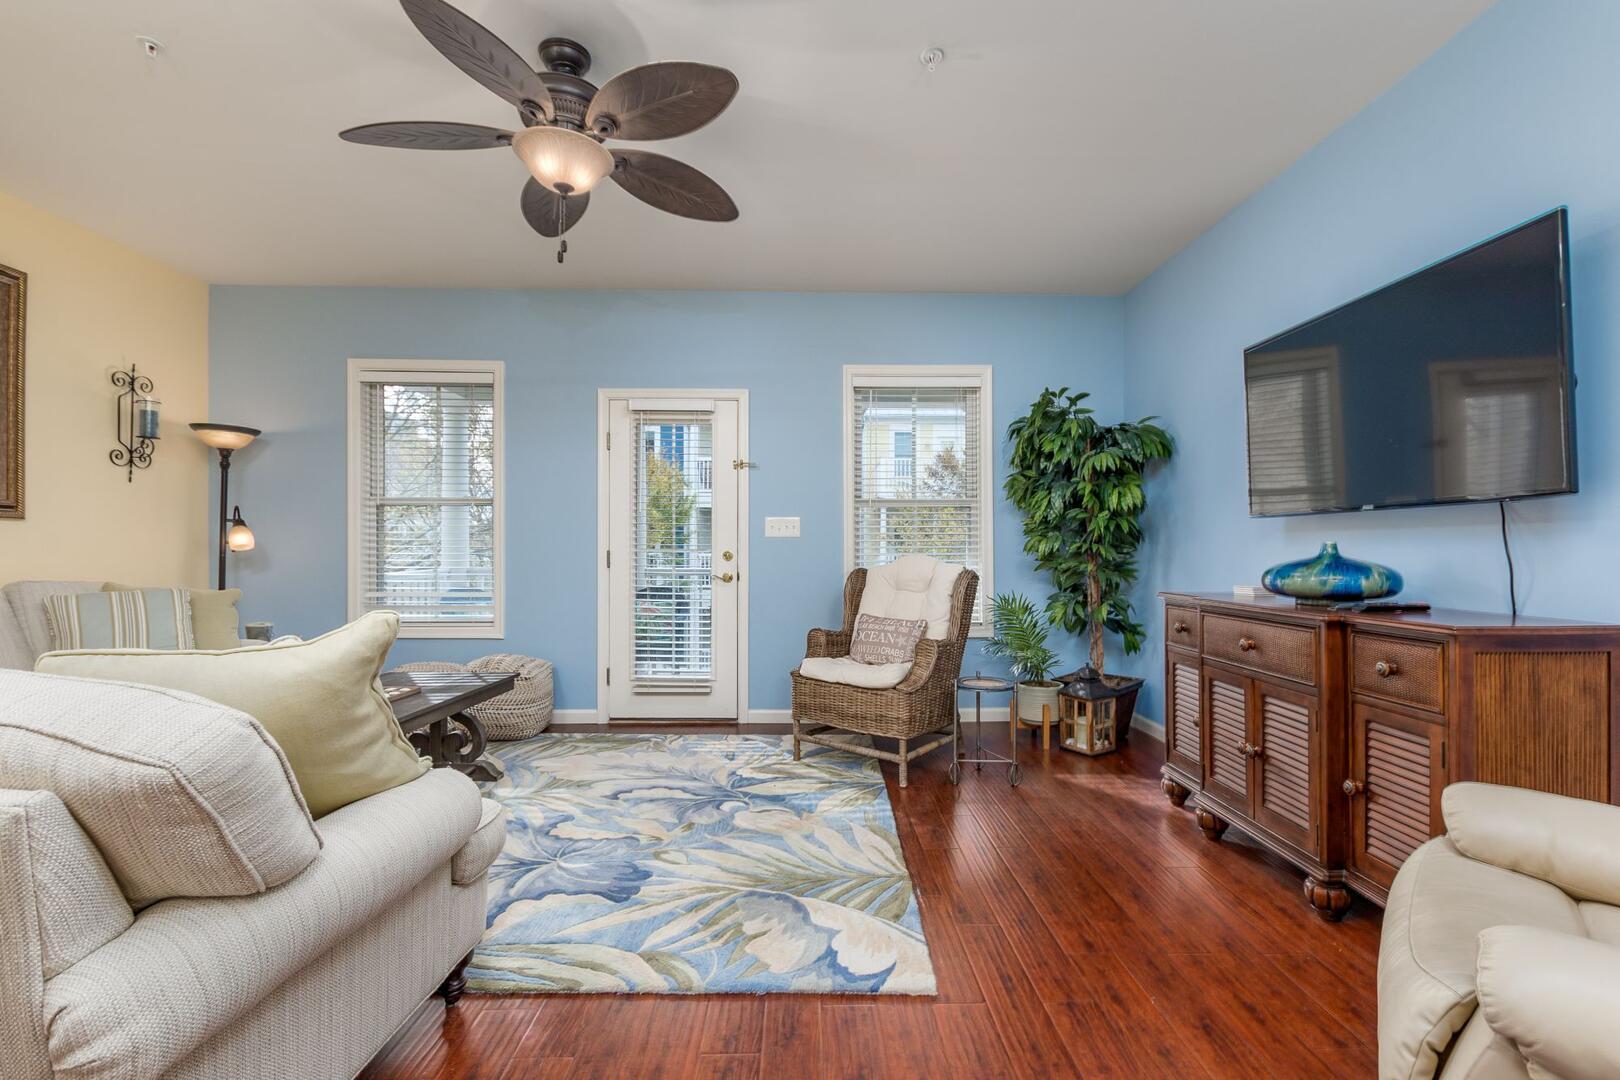 Living Room - Sunset Island 34 Island Edge Dr.